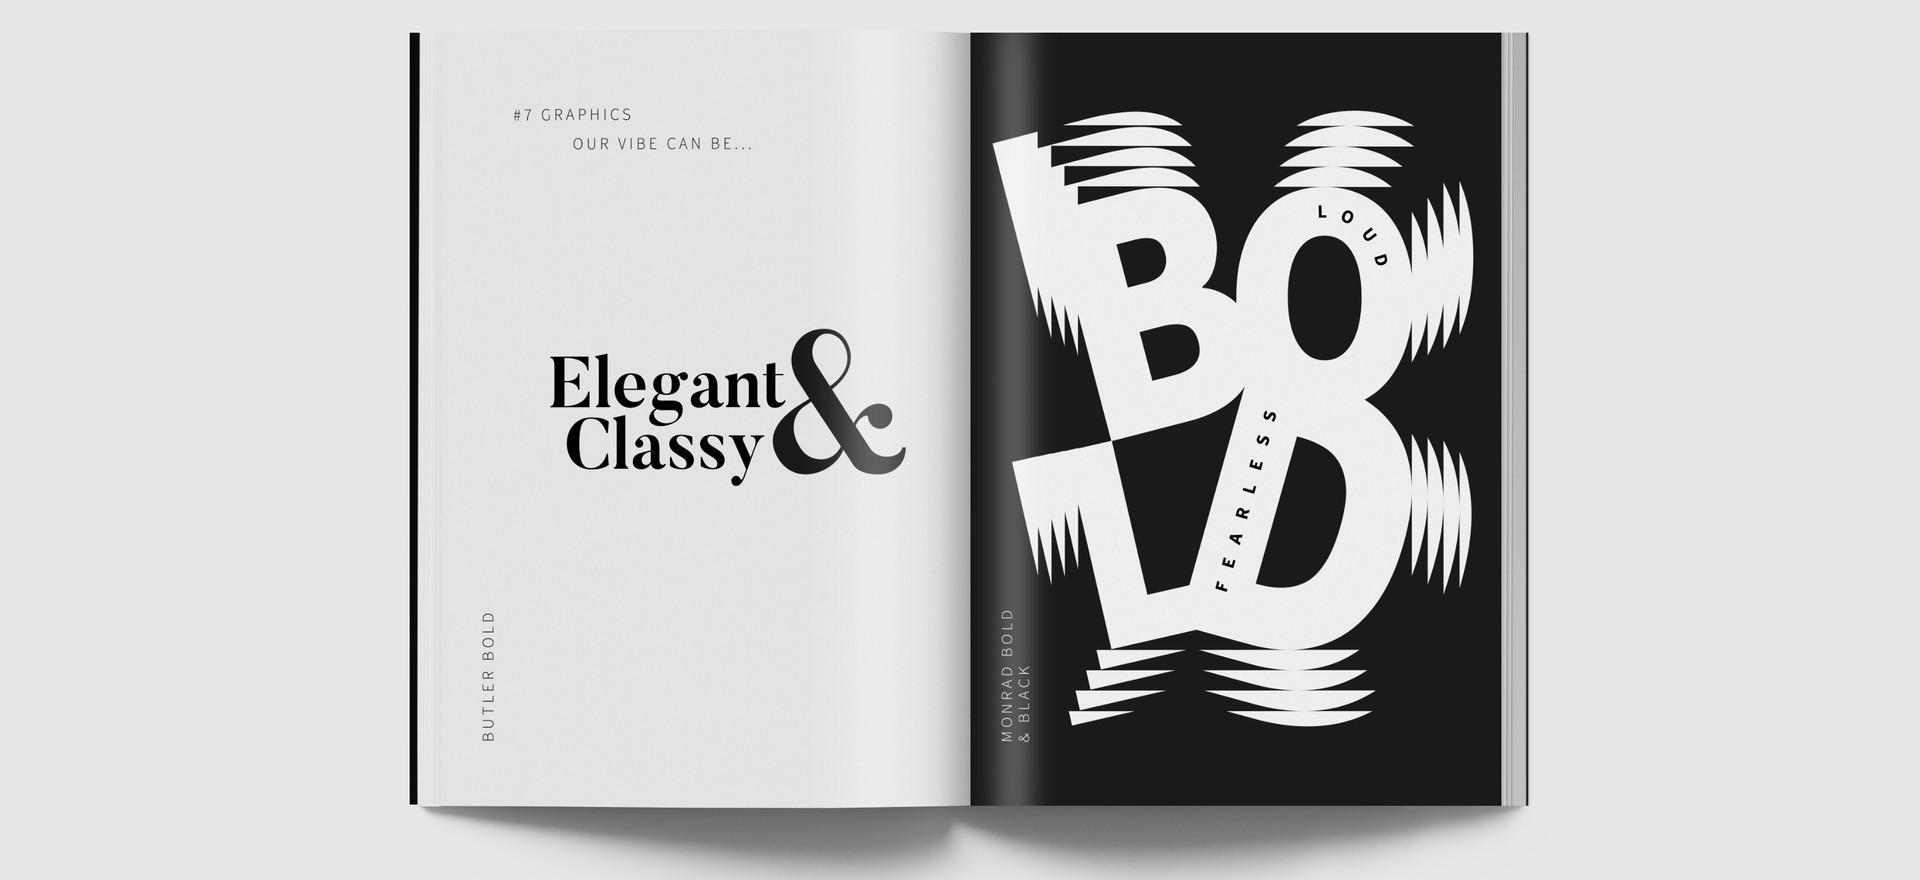 Rebl Brand book